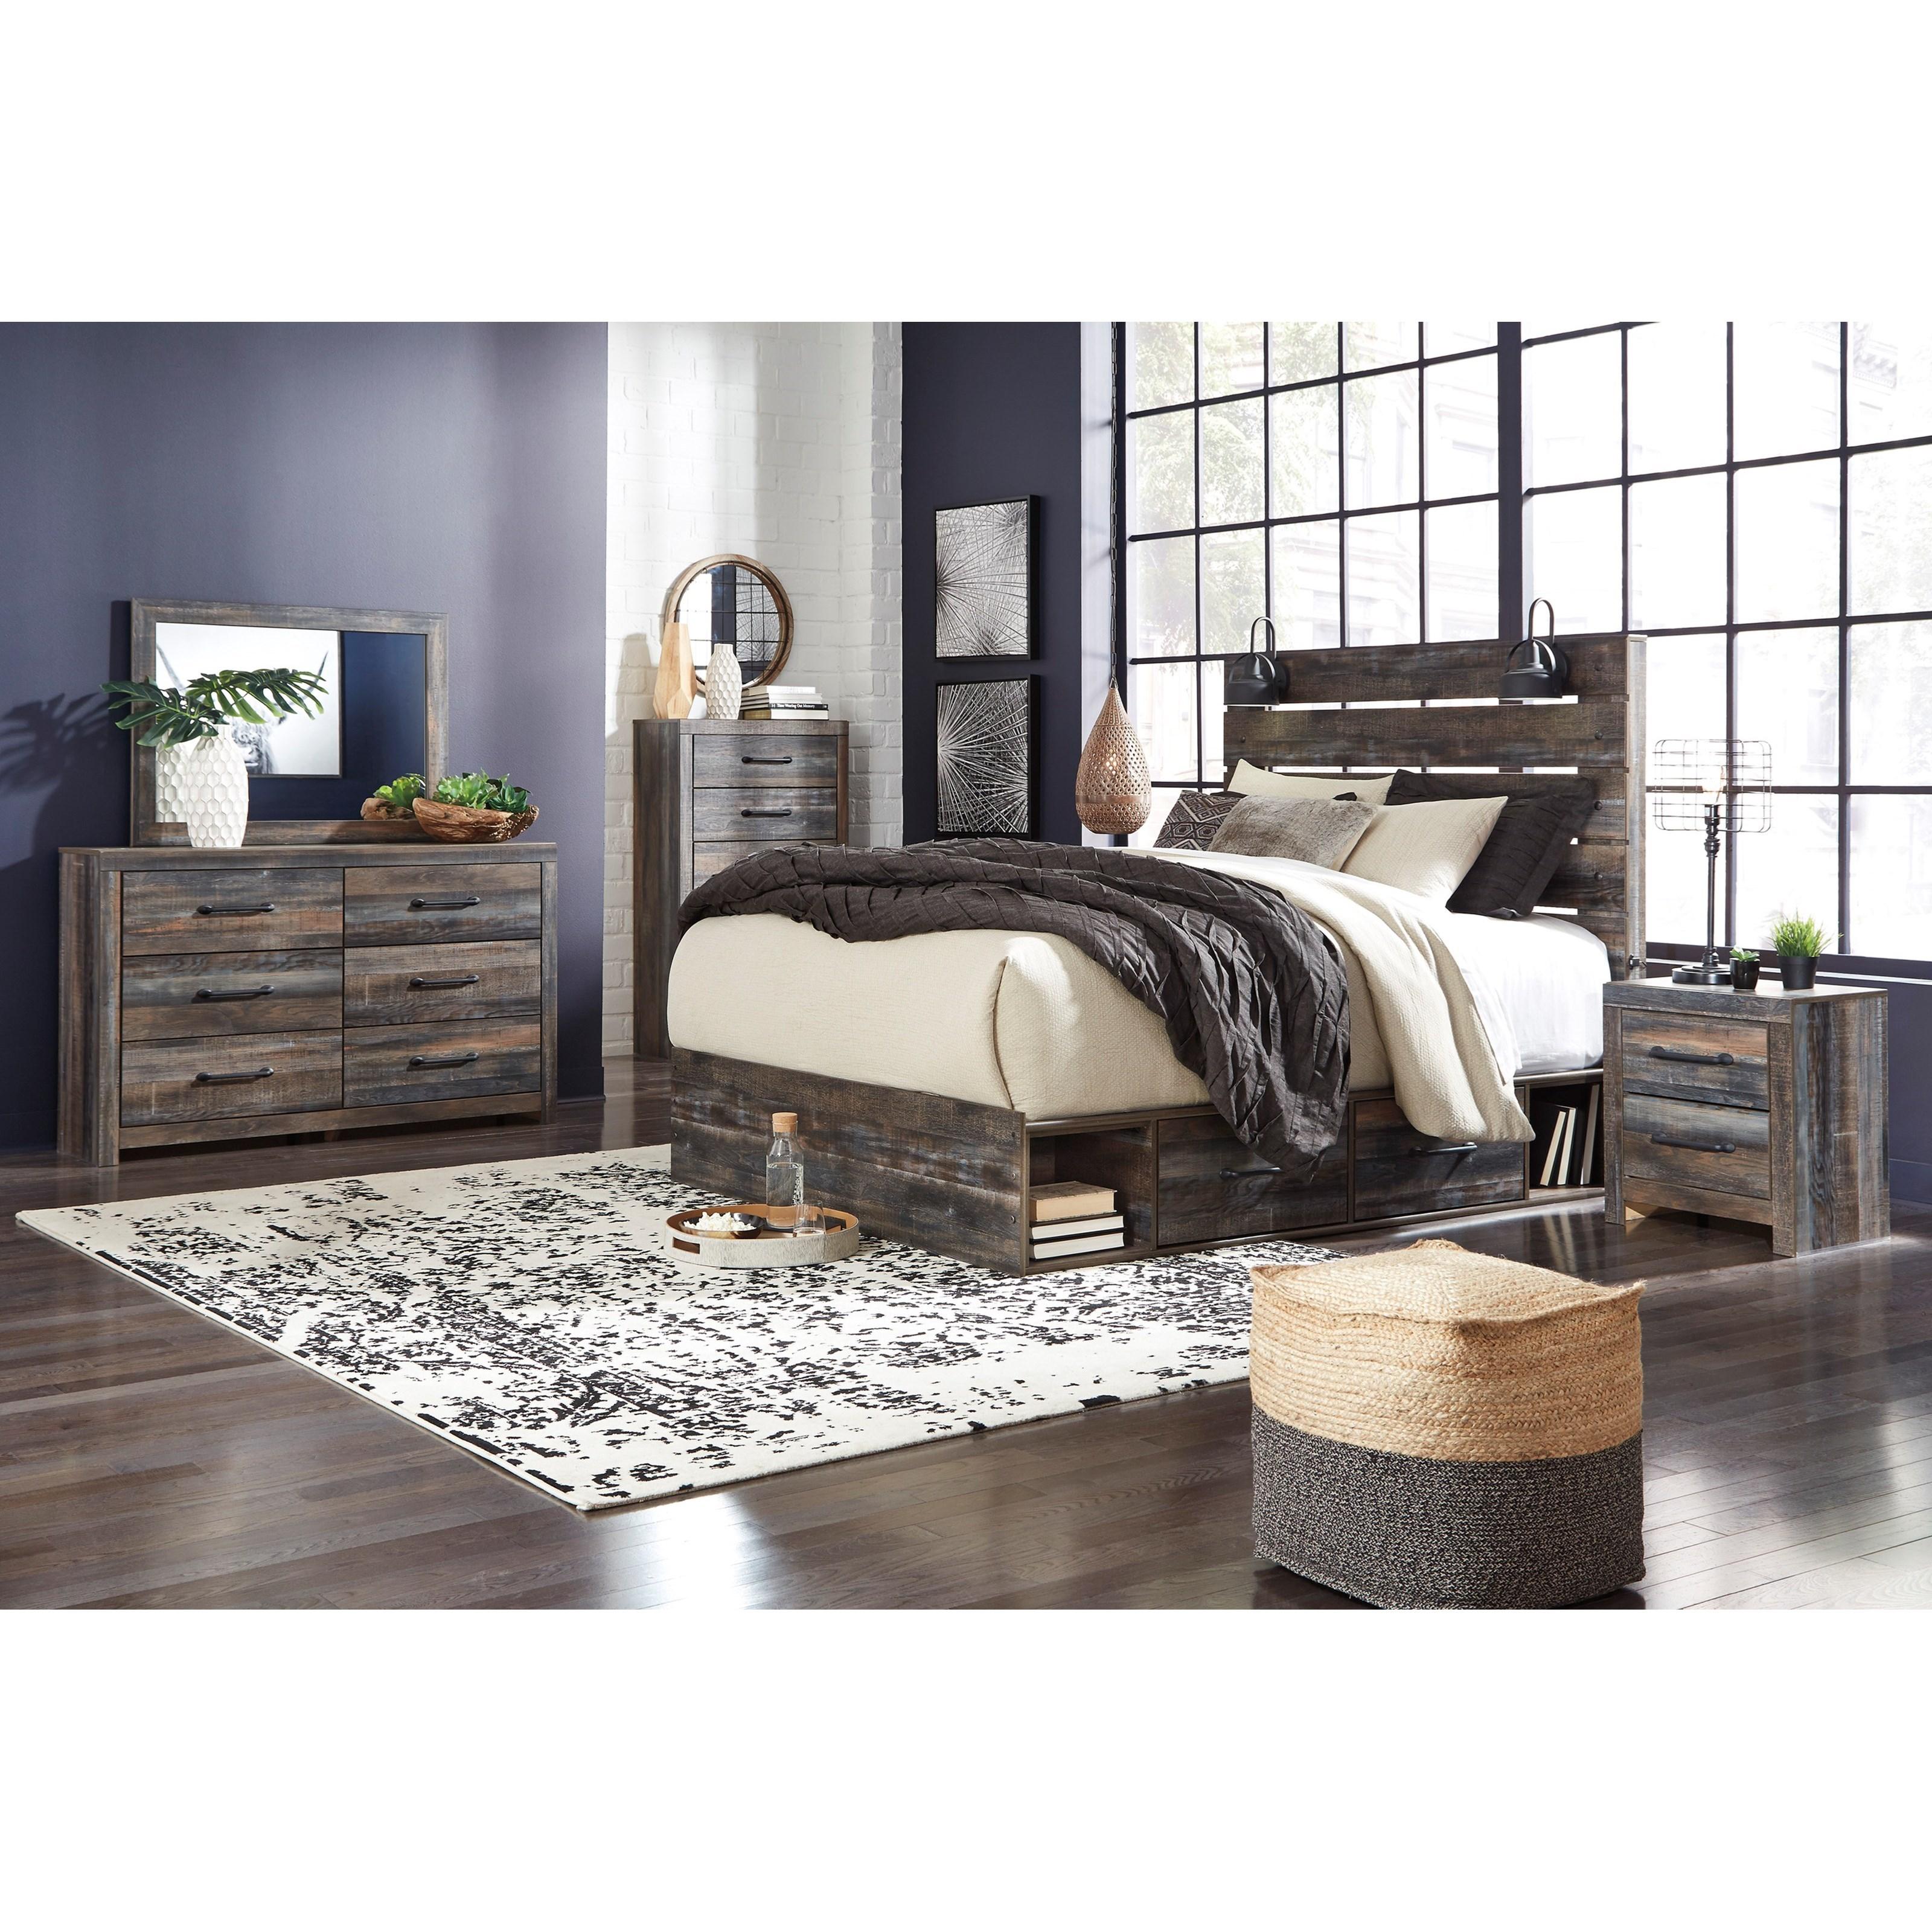 Ashley Furniture In Colorado: Signature Design By Ashley Drystan Rustic 6-Drawer Dresser